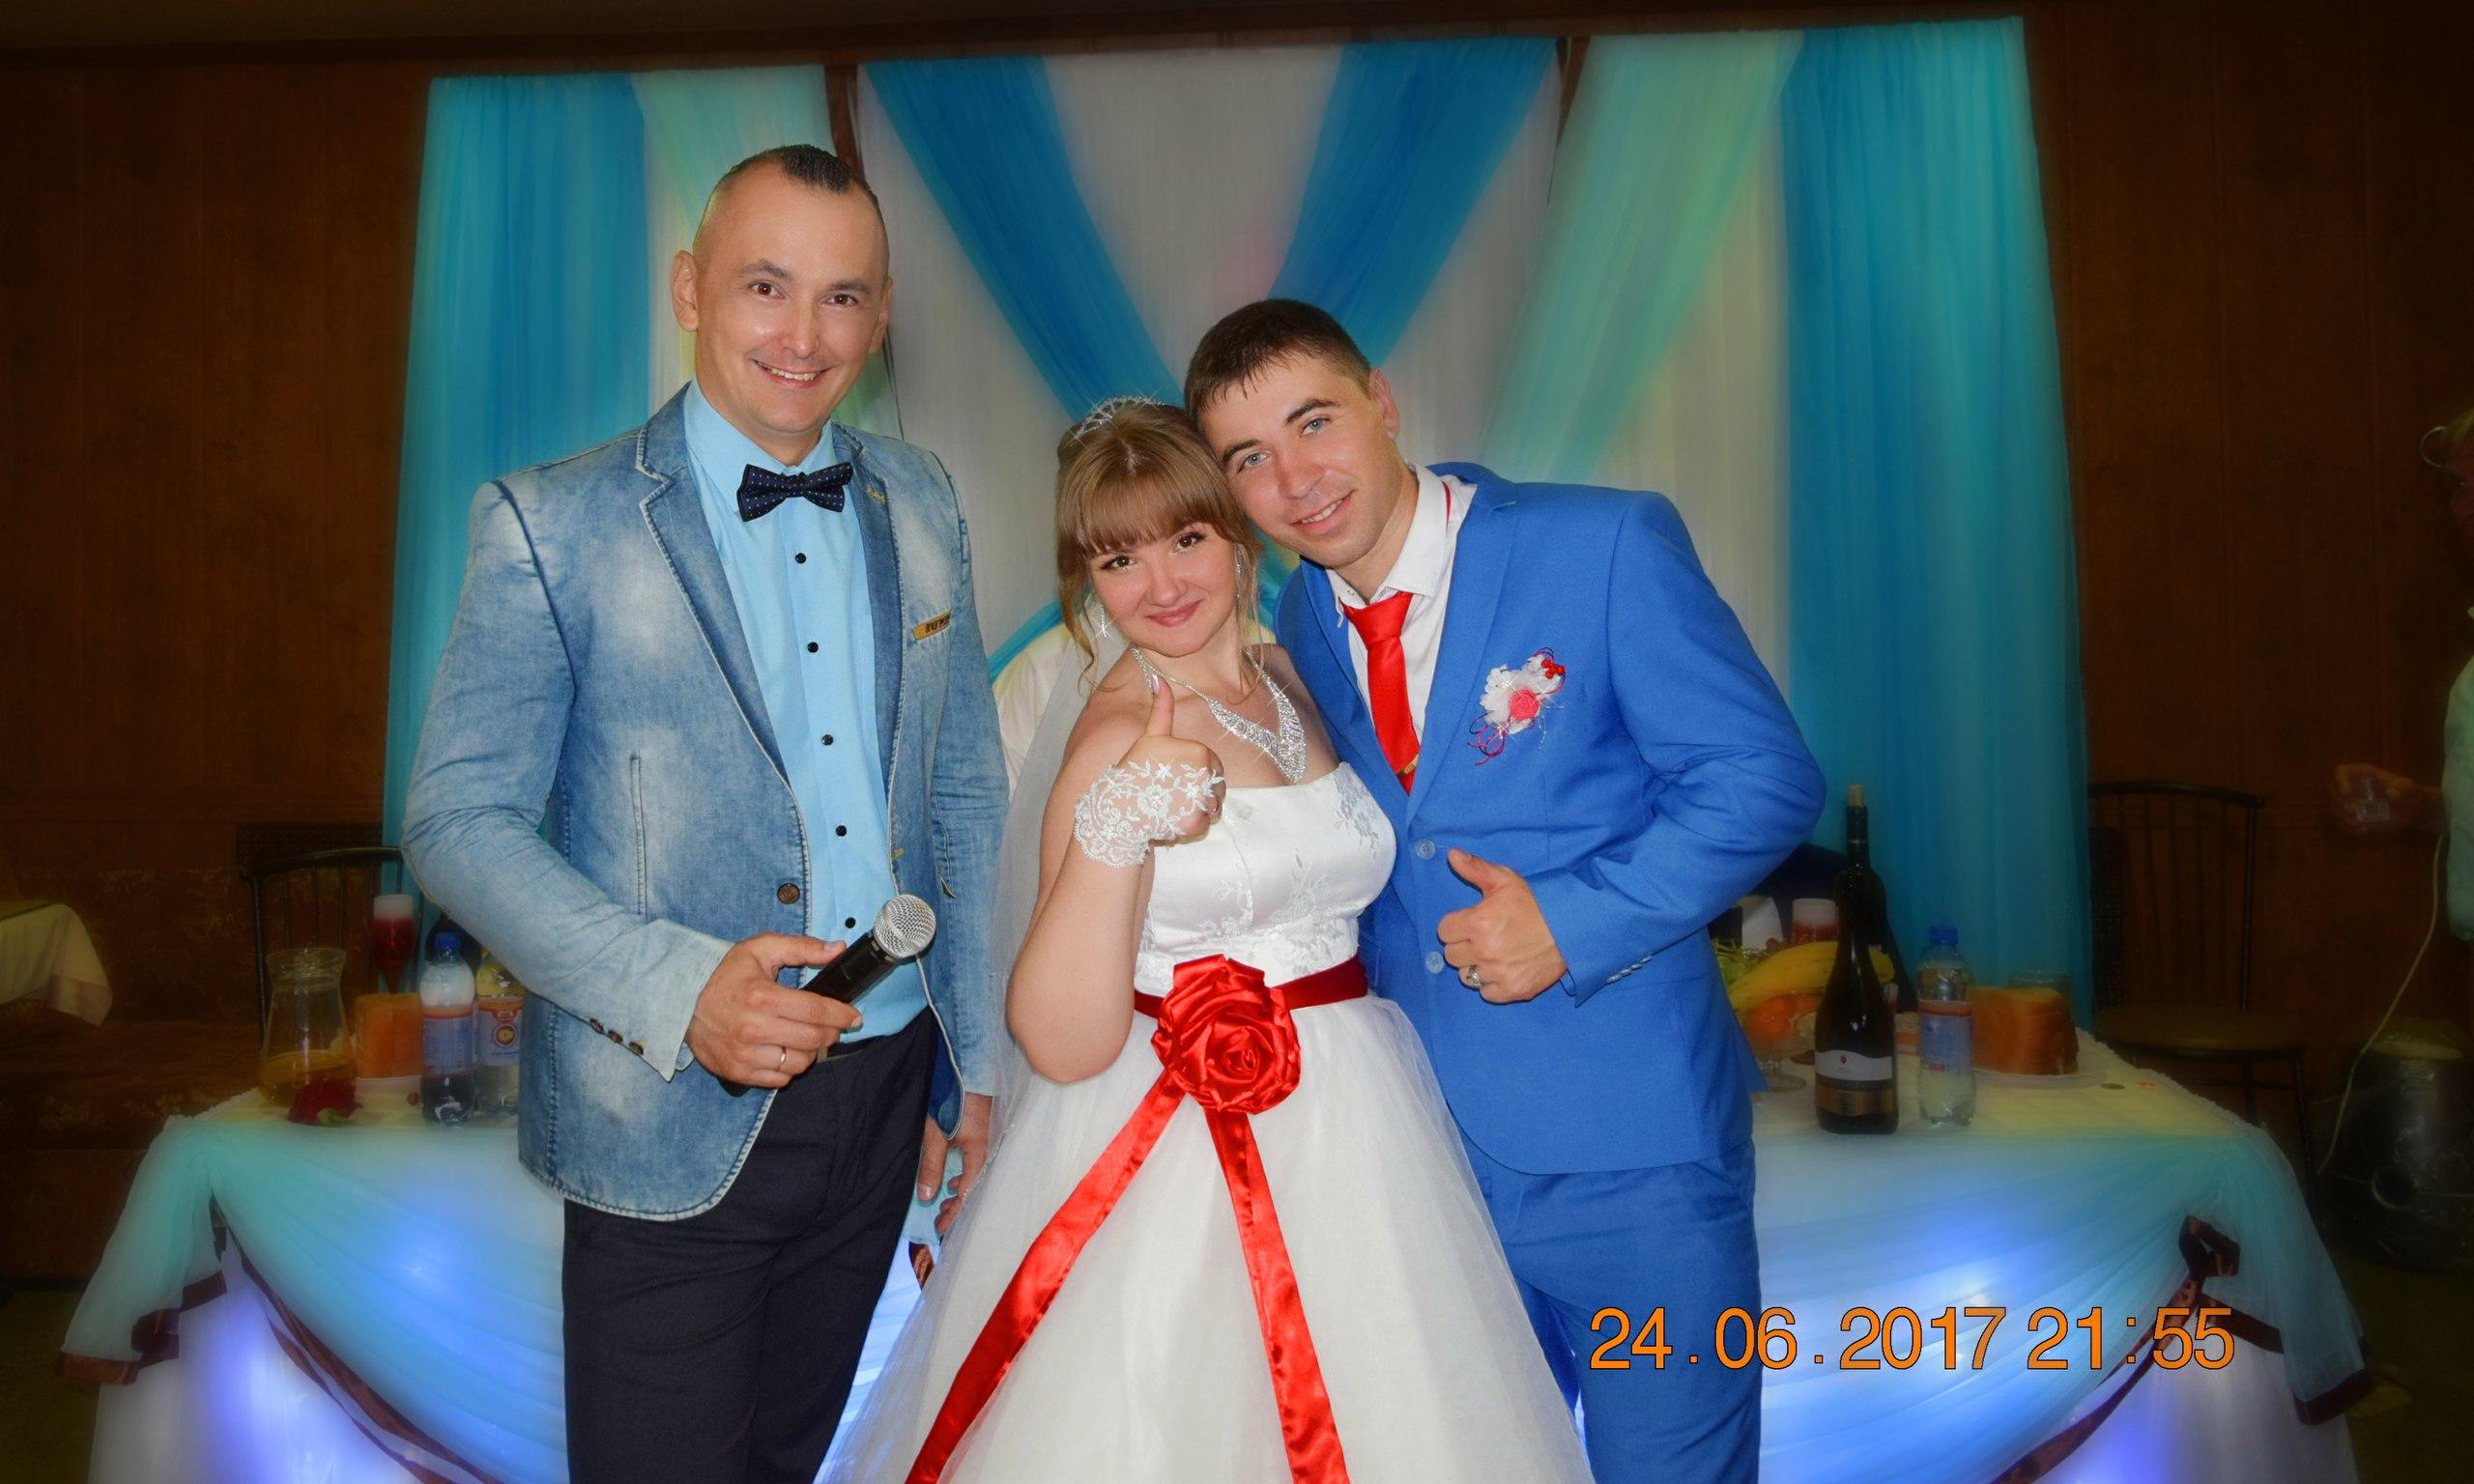 d5nMNf1x1fo - Свадьба Максима и Виктории